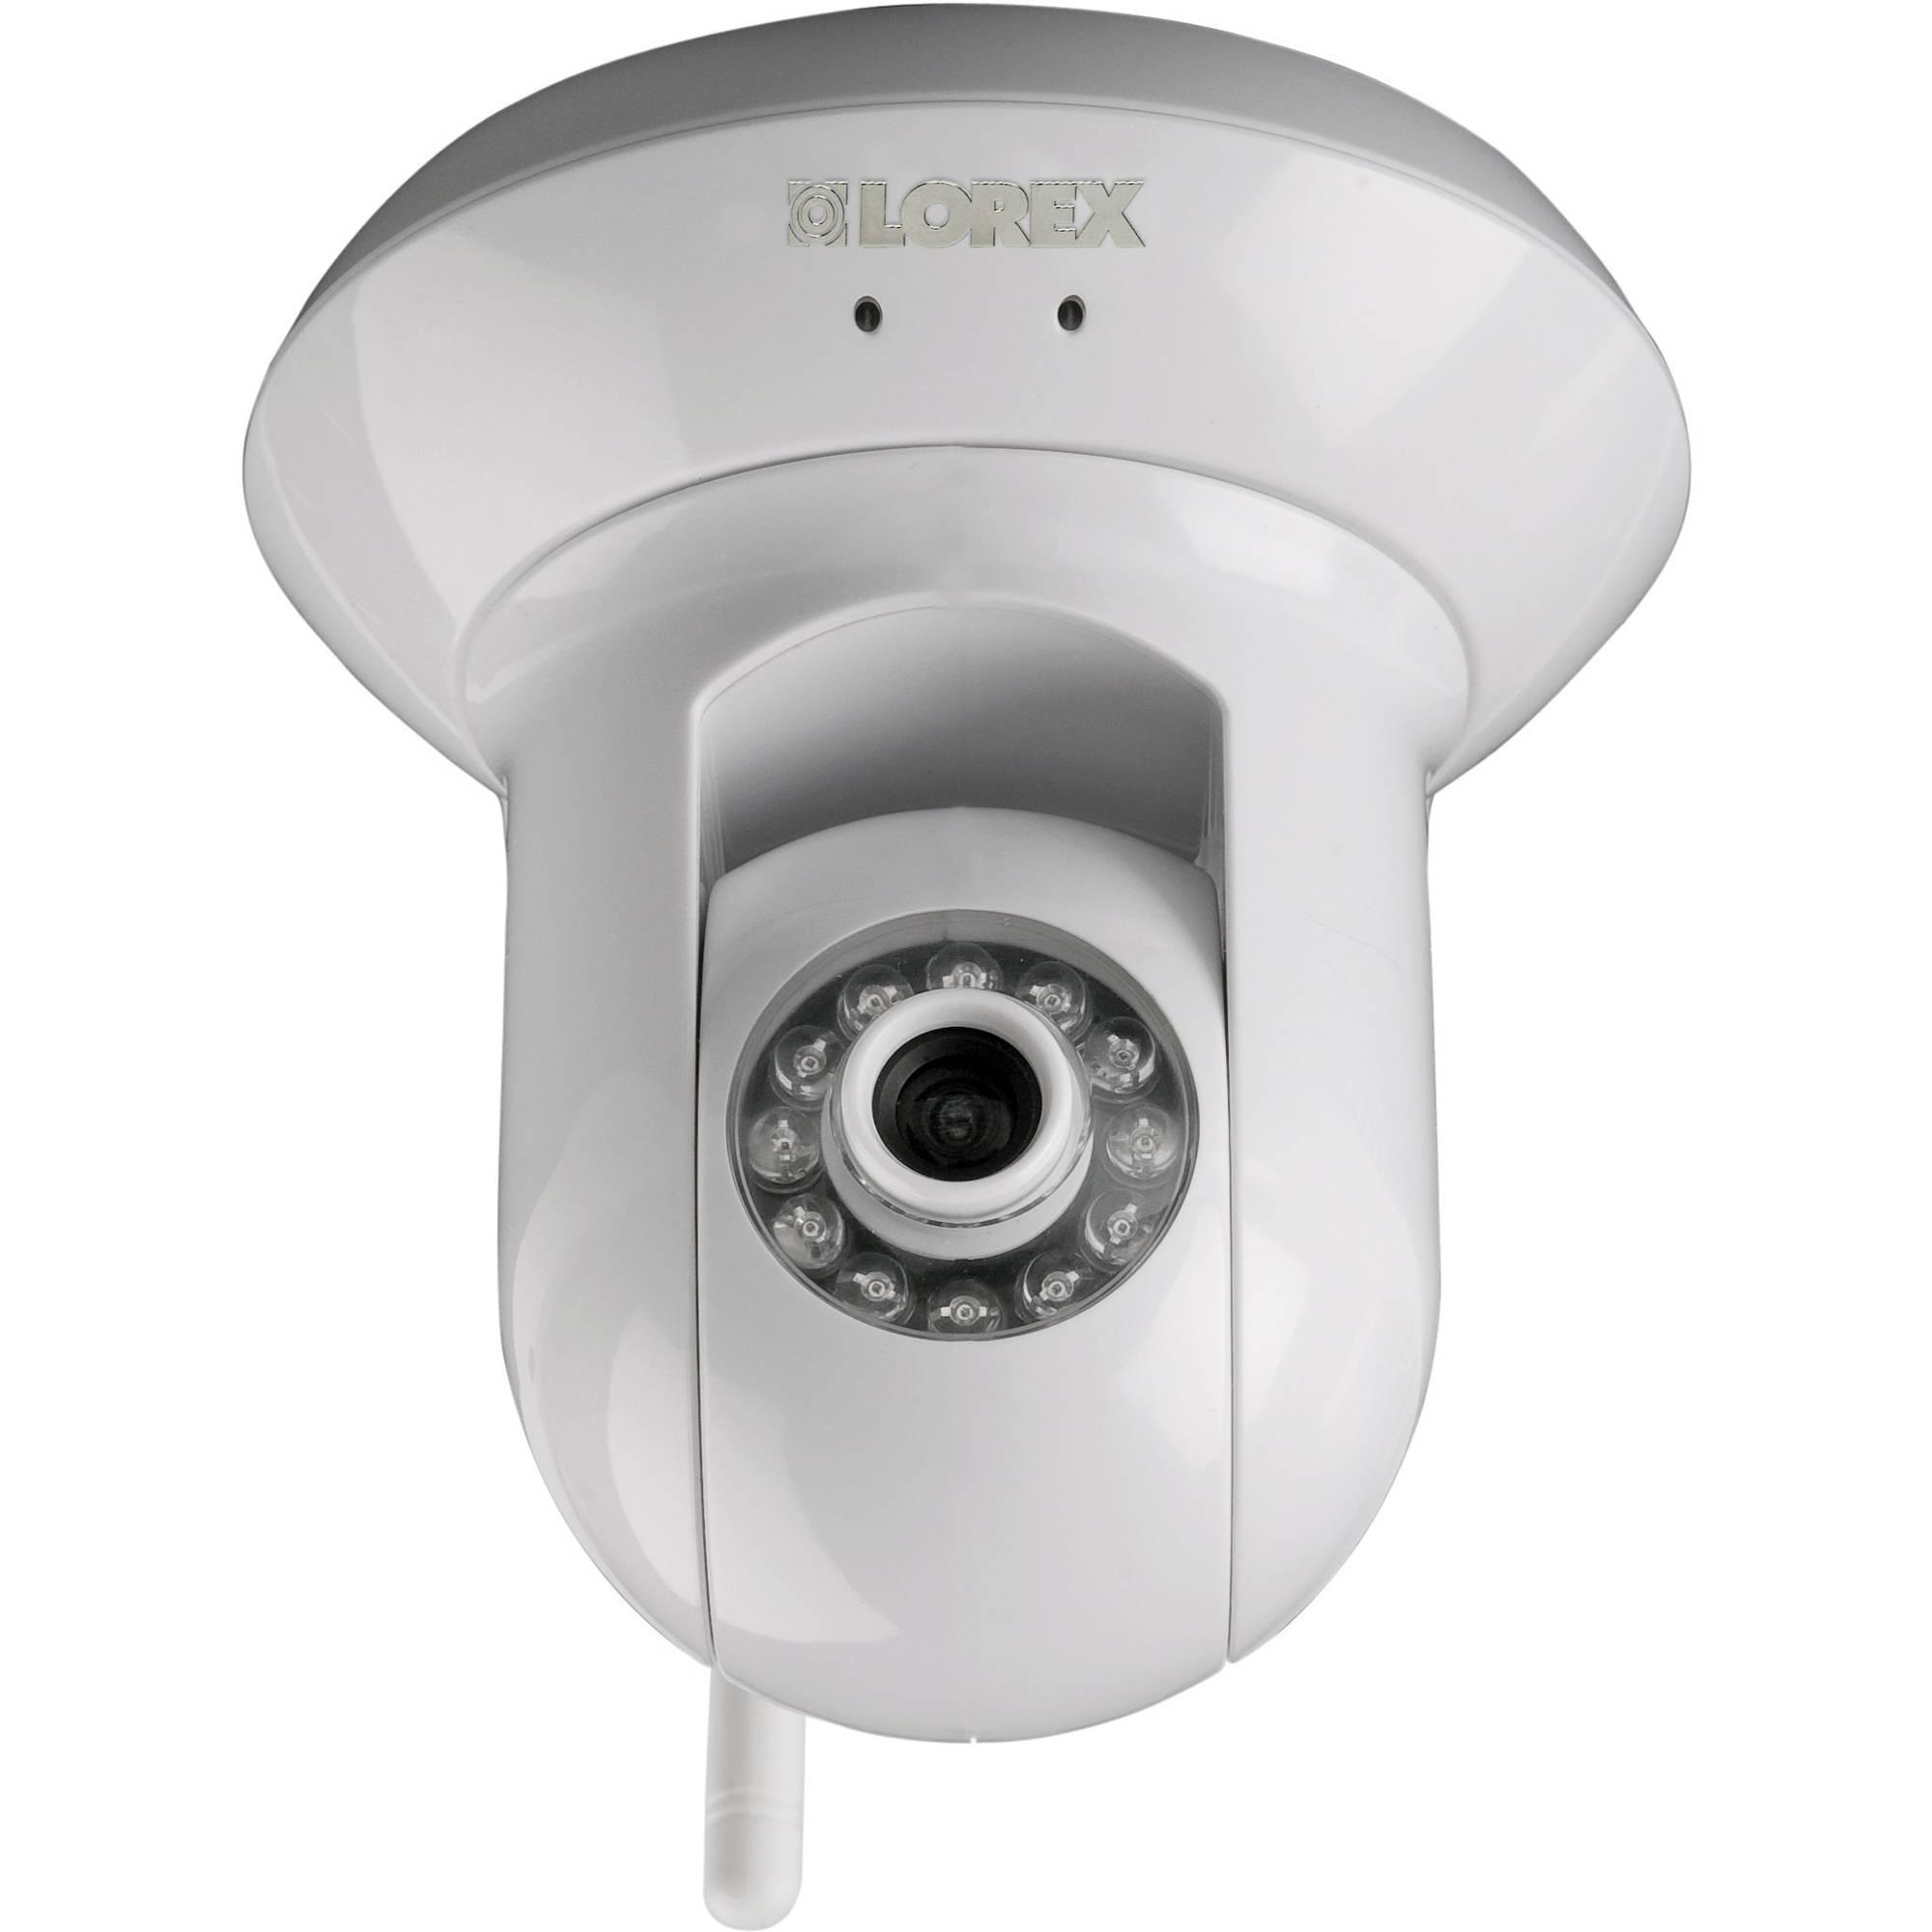 Lorex Remote Surveillance Camera